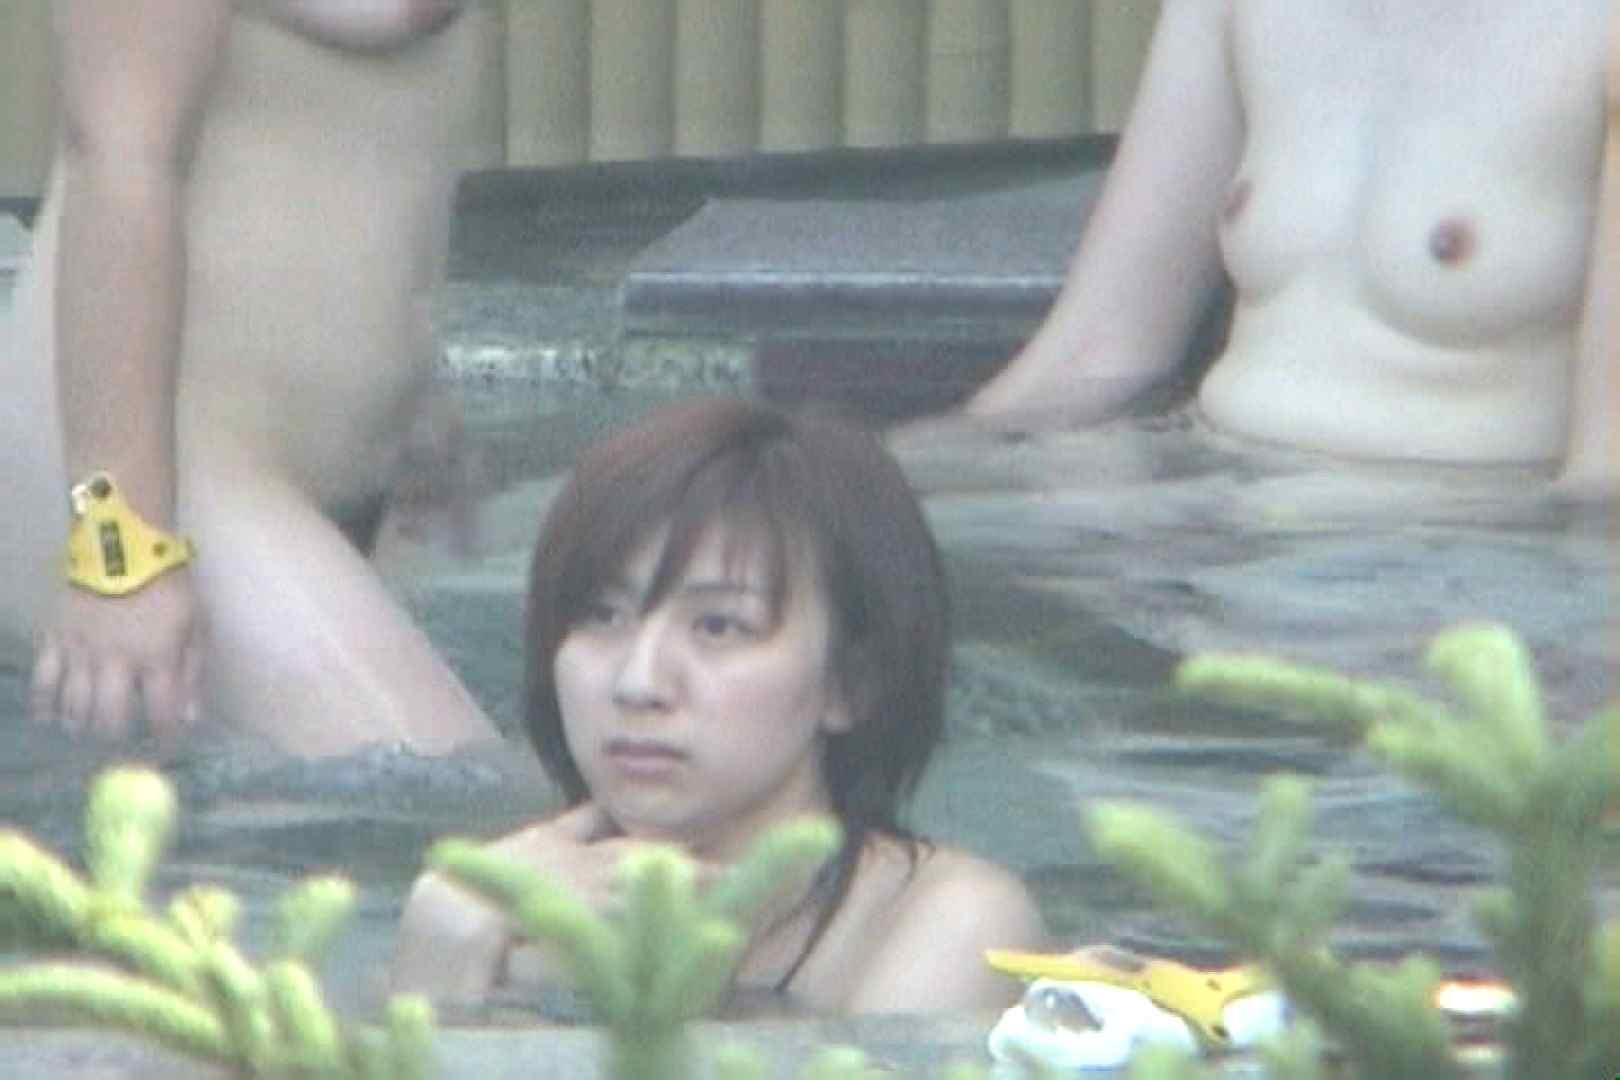 Aquaな露天風呂Vol.77【VIP限定】 露天   盗撮特集  98画像 10